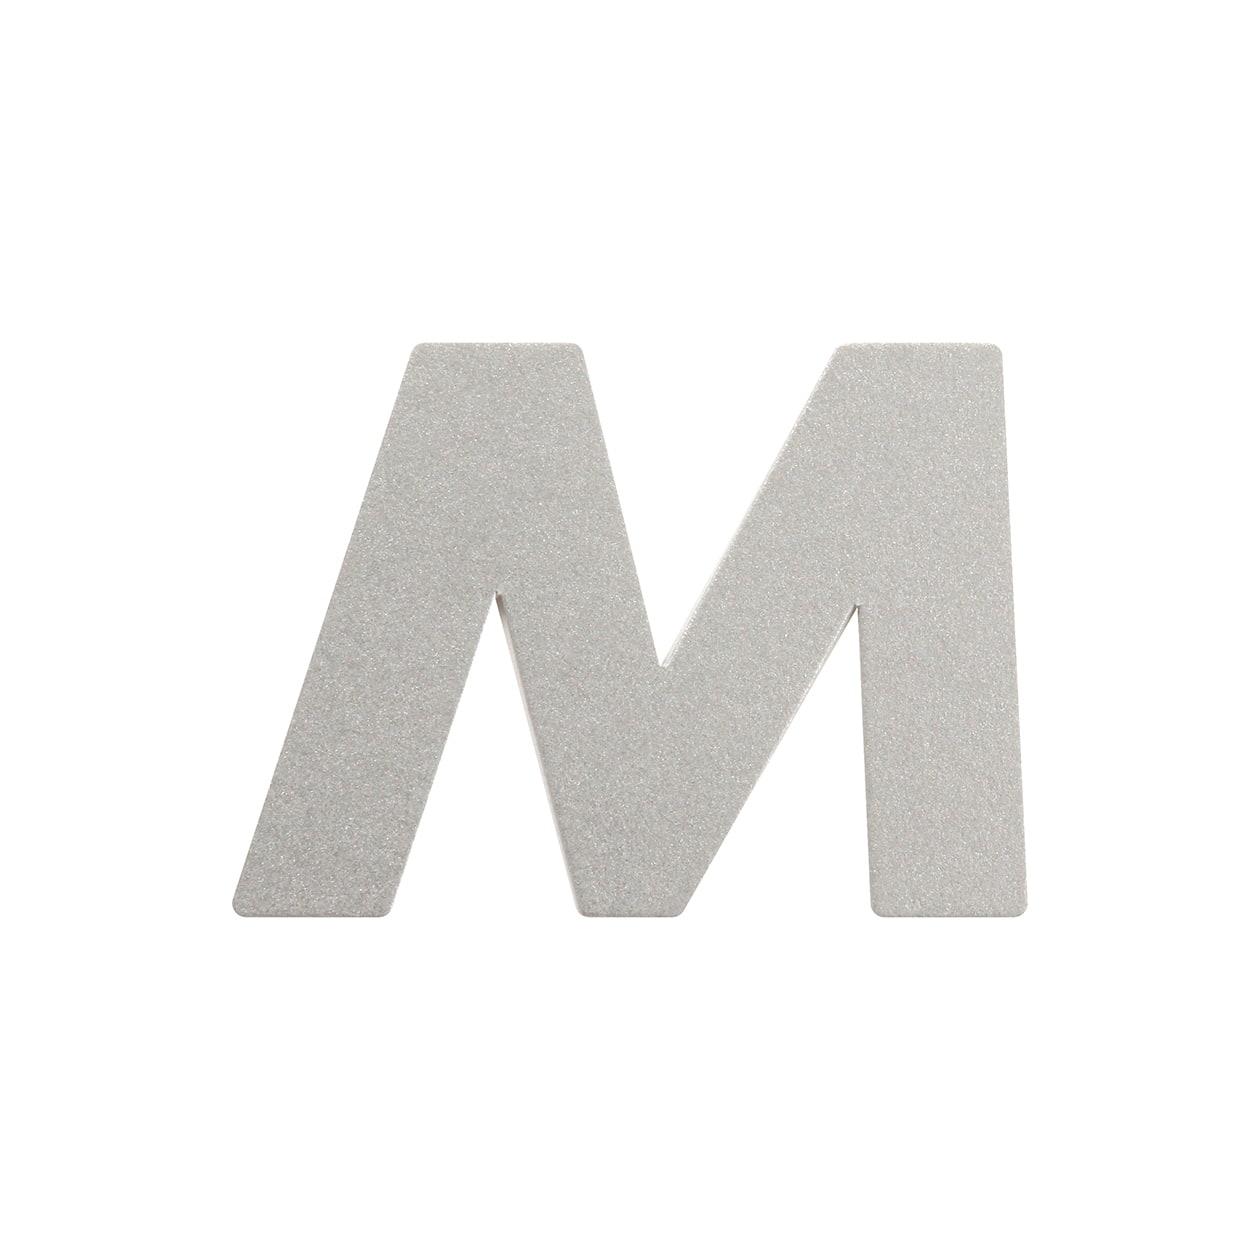 No.395ボード A7カードDC 文字M シルバー